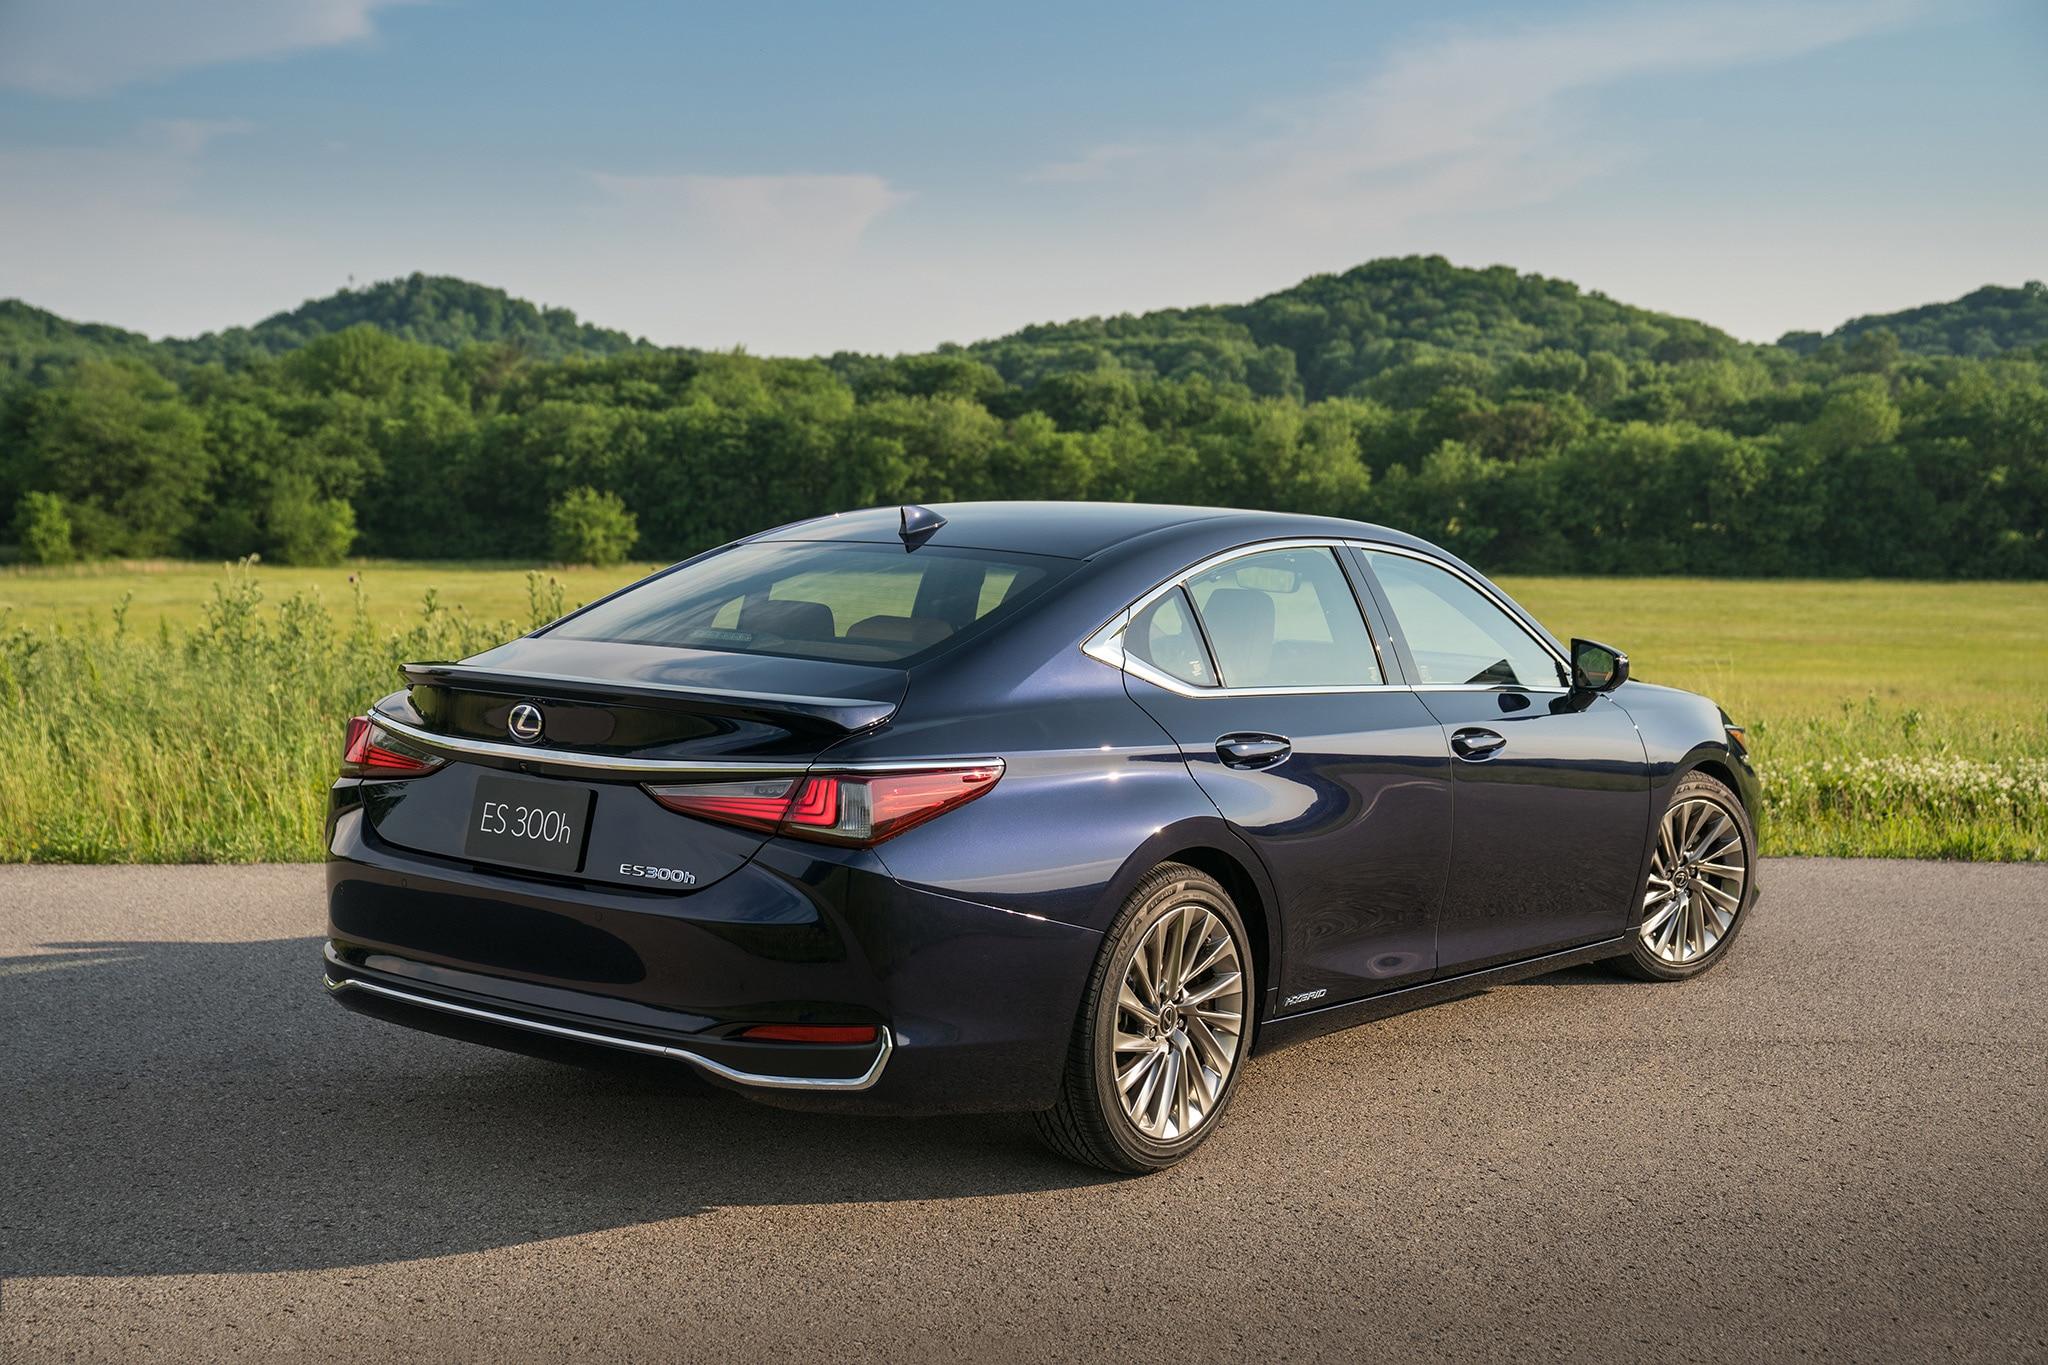 GALLERY: 2019 Lexus ES 300h